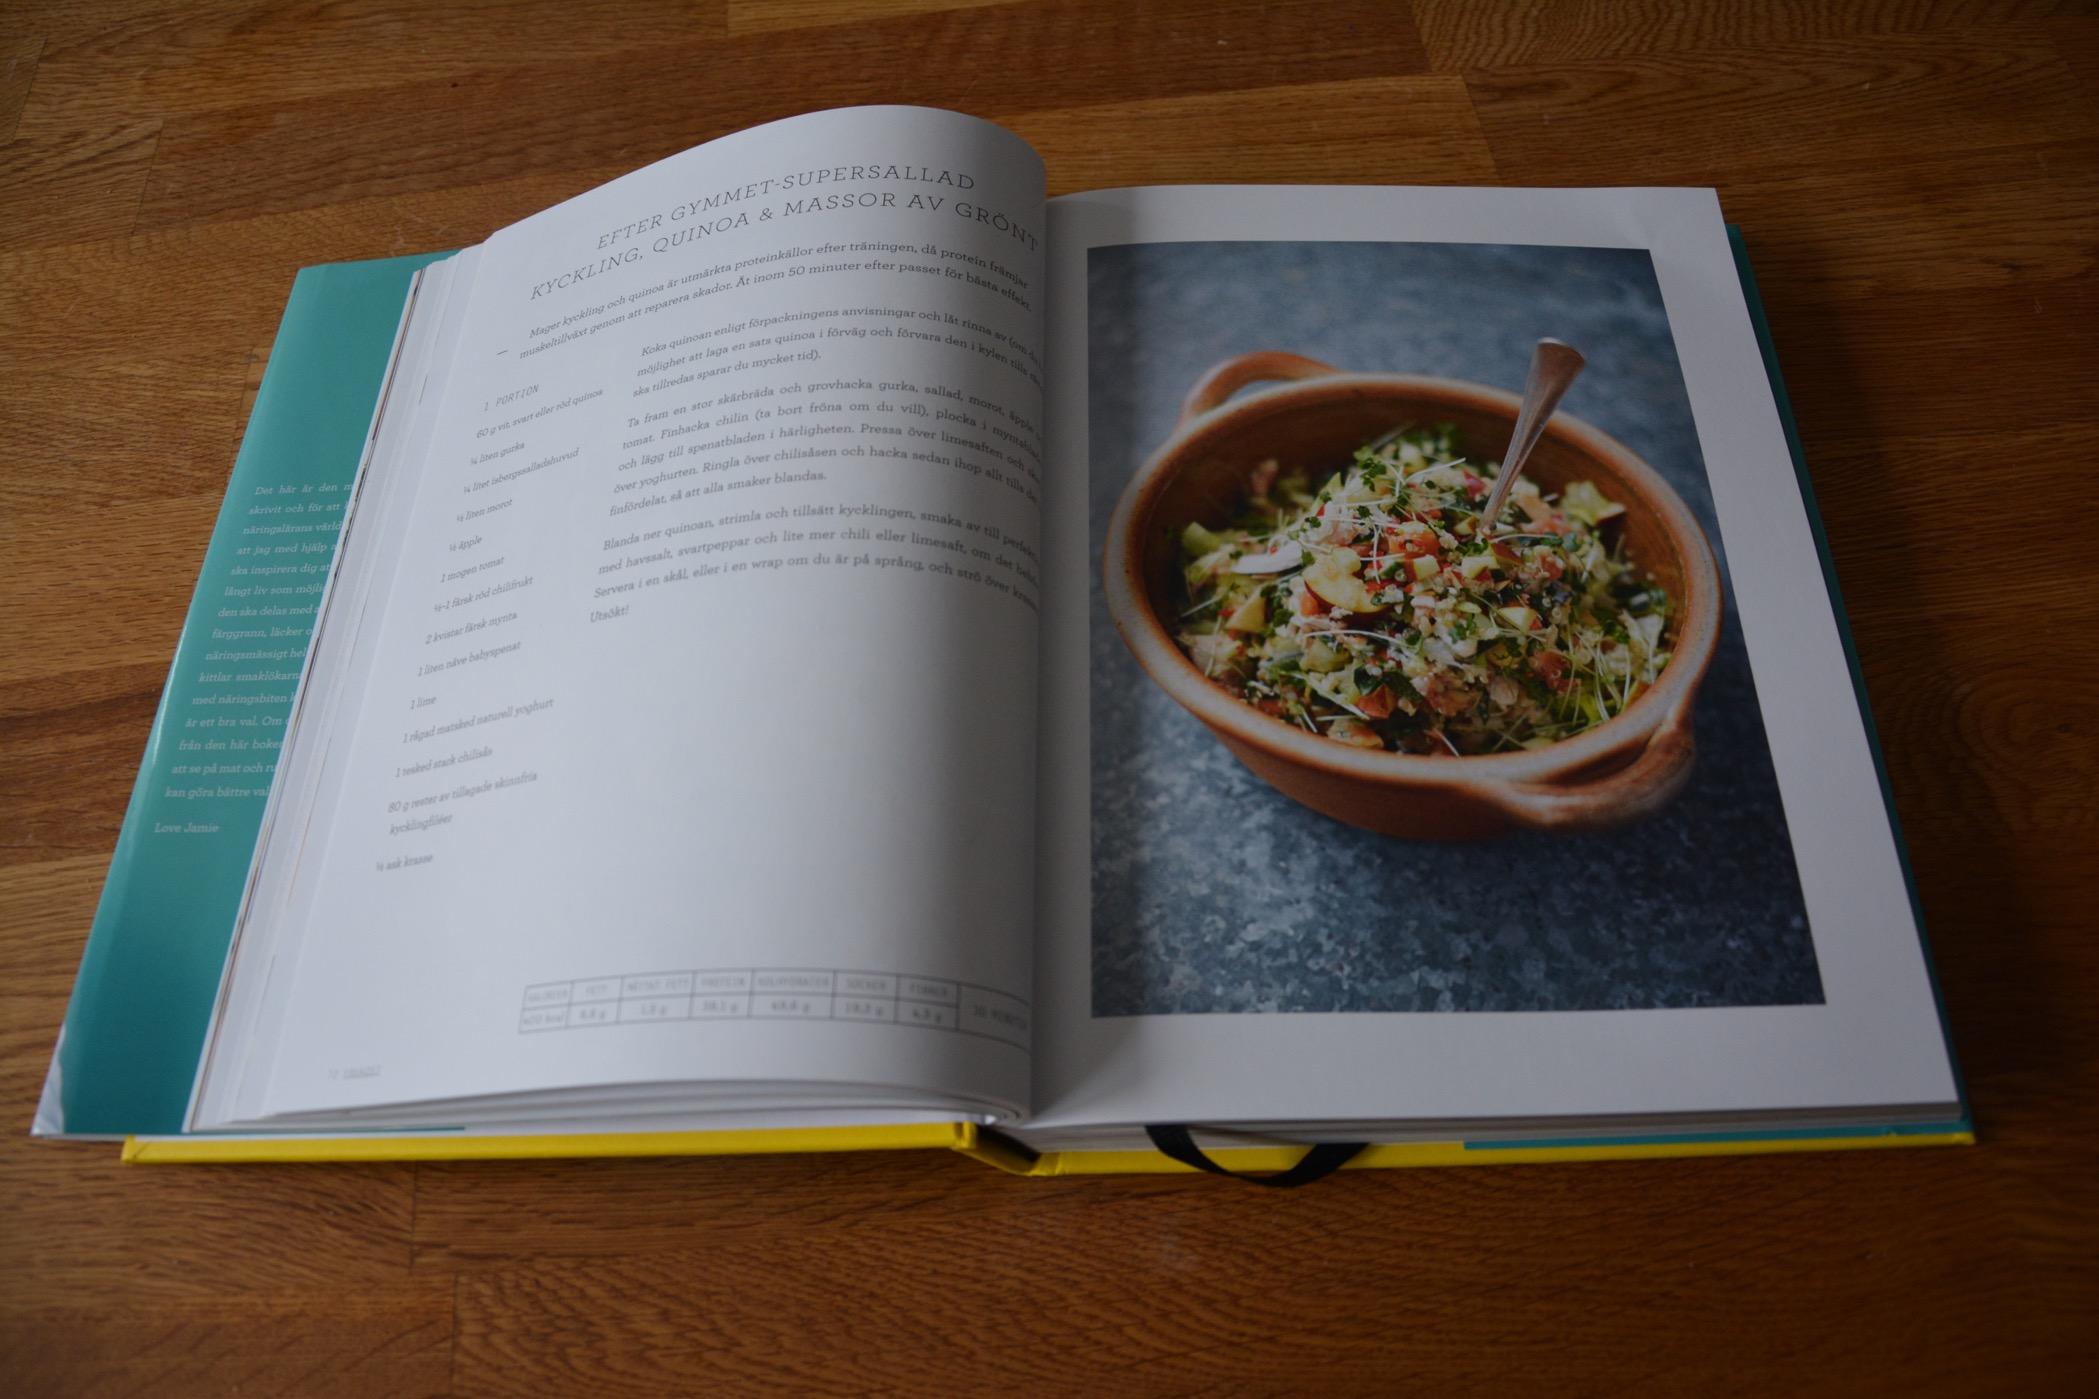 jamie olivers supermat recept